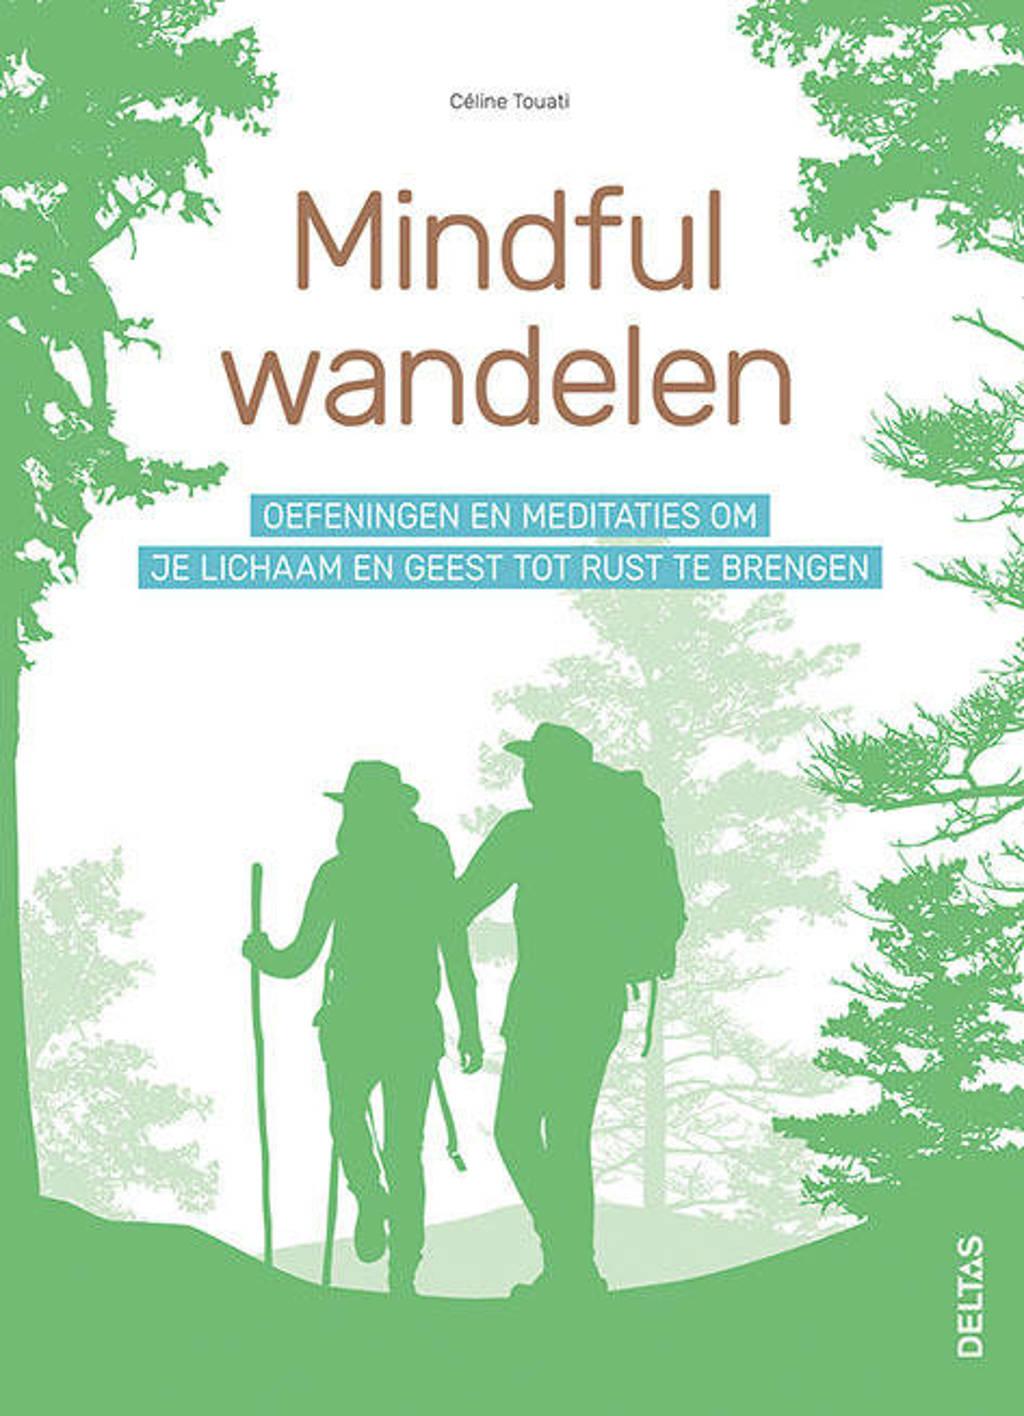 Mindful wandelen - Celine Touati